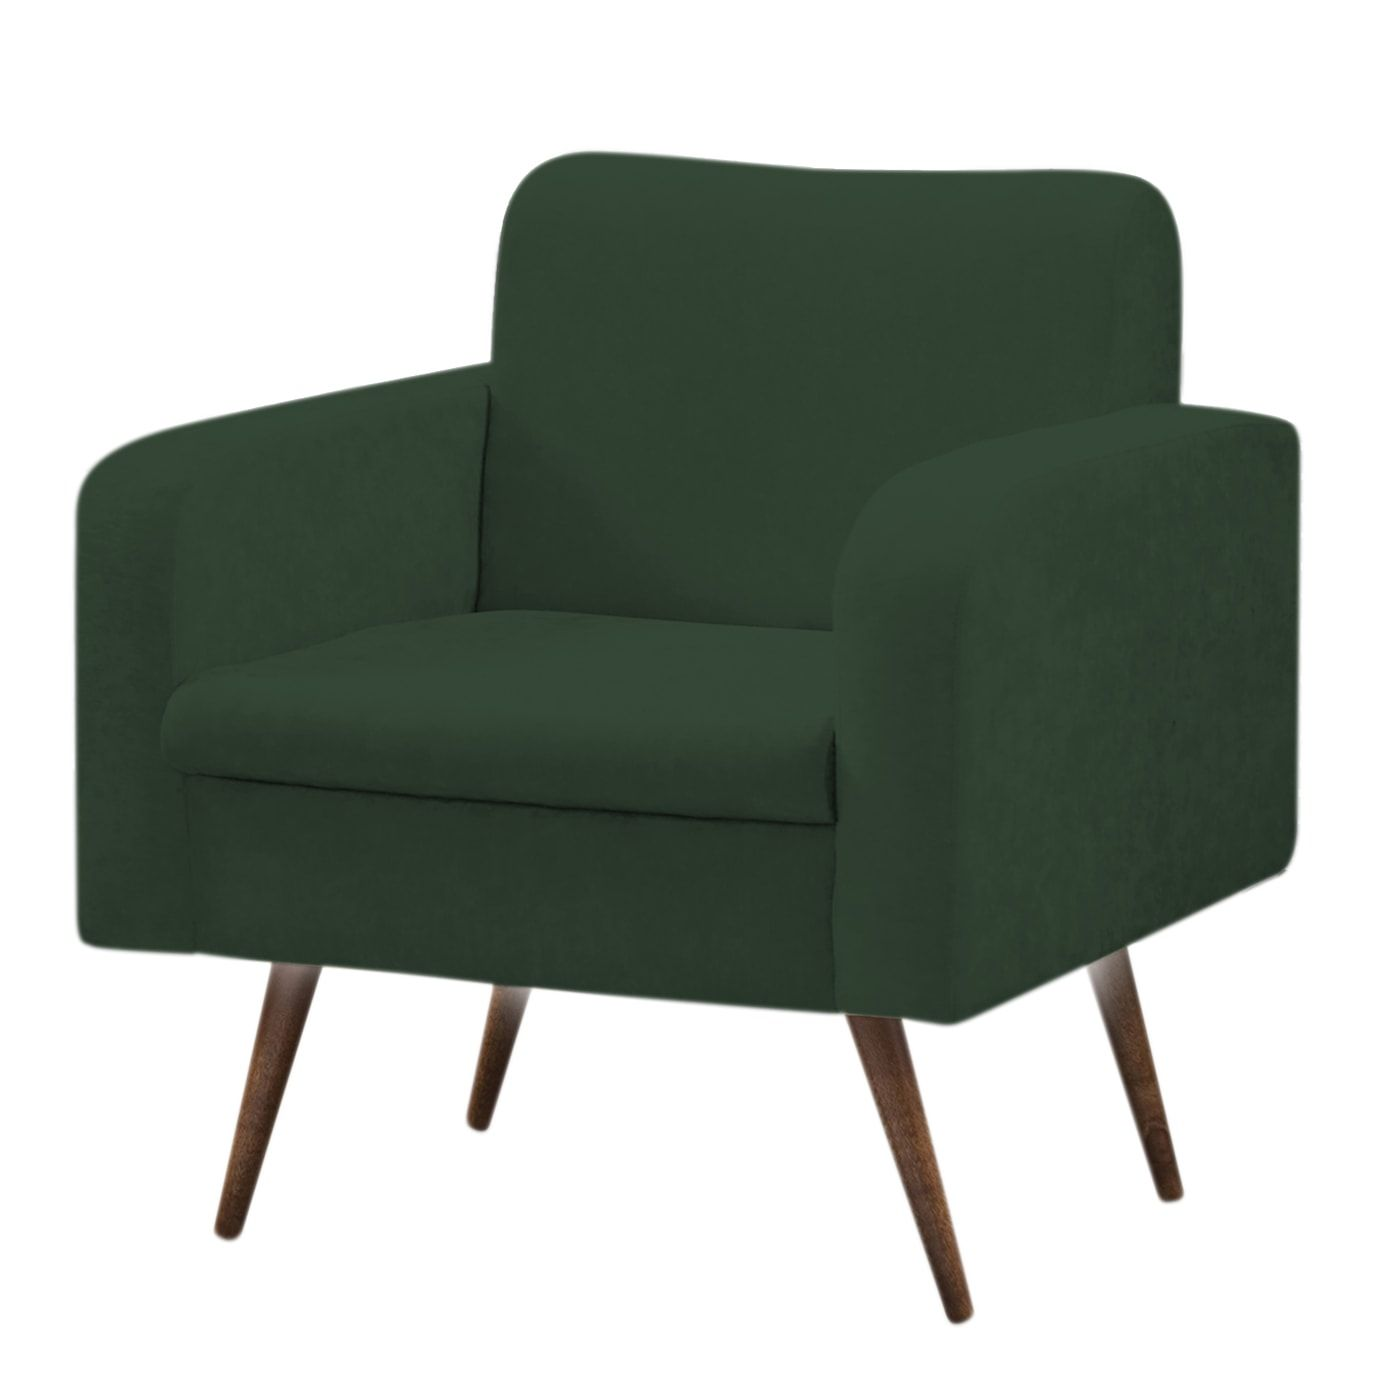 Poltrona Decorativa  Jade - Estoara